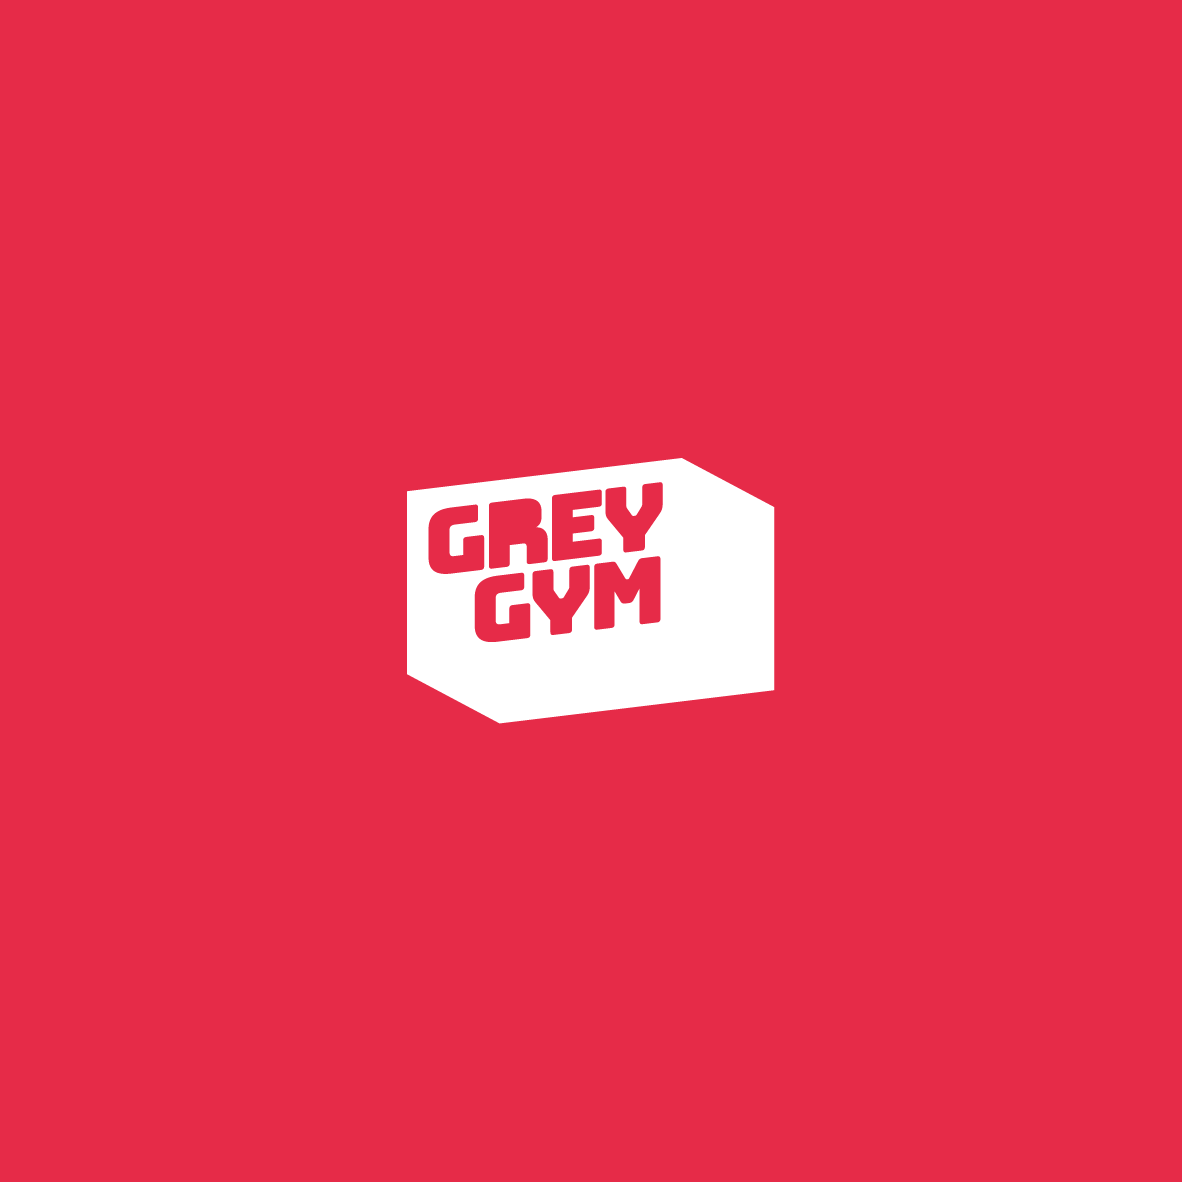 36_GREY GYM.png